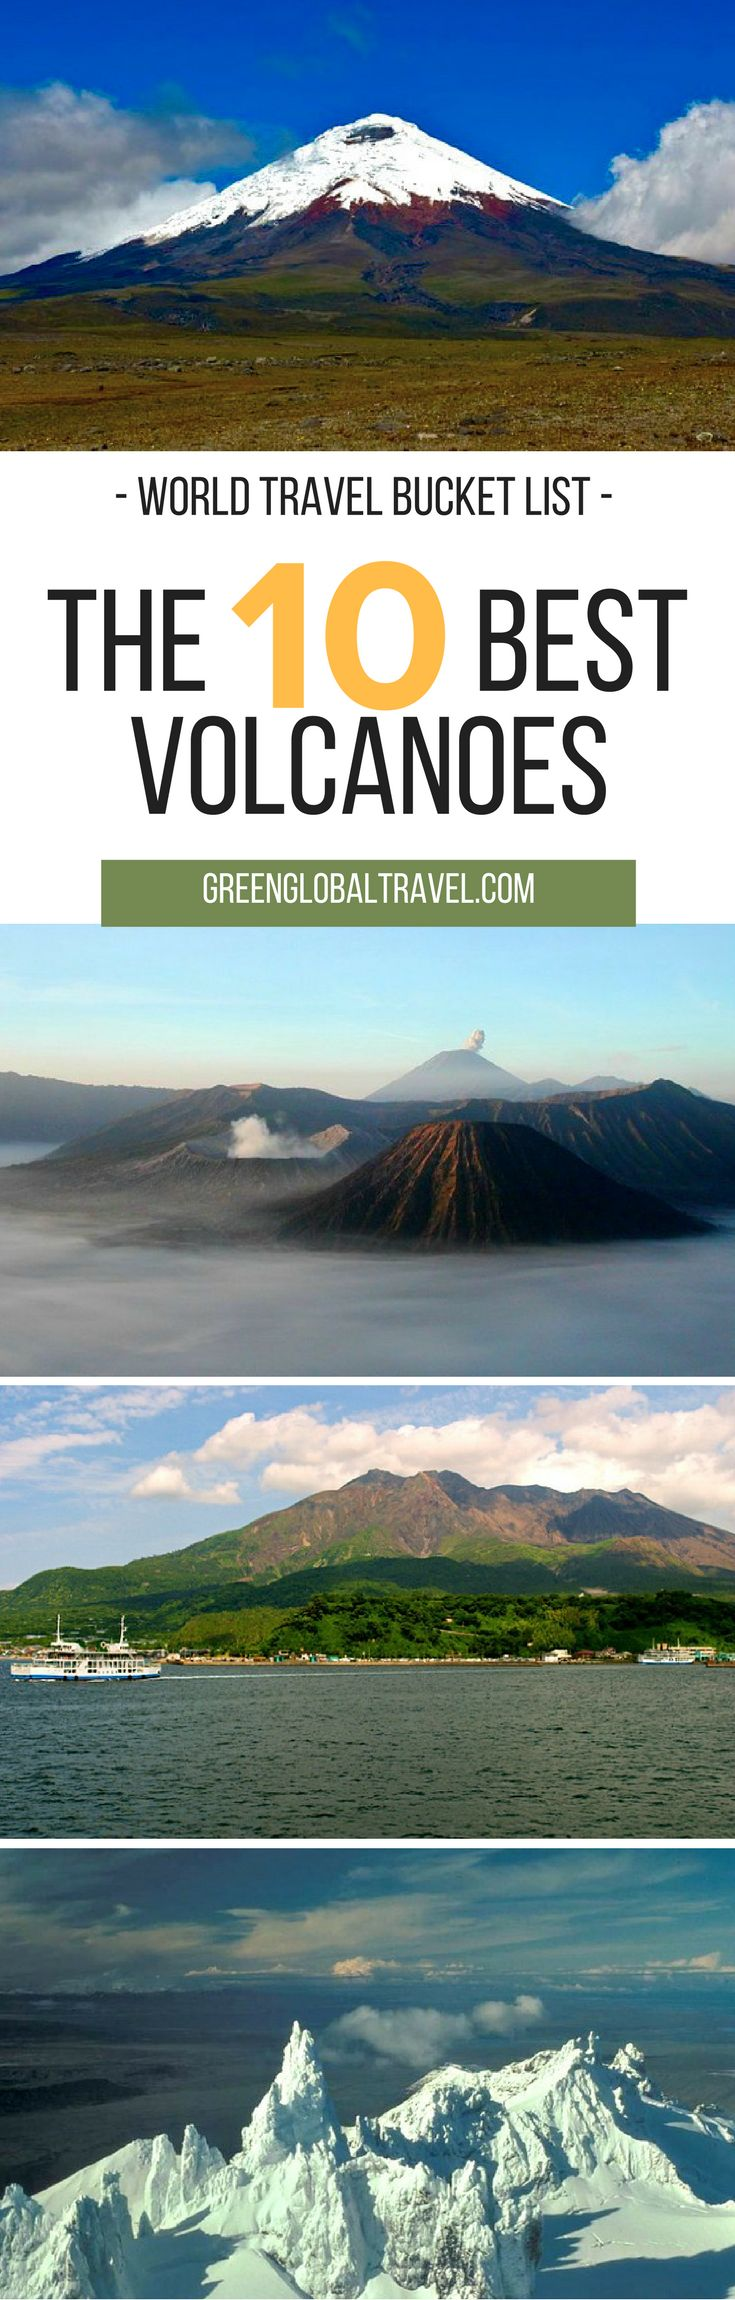 Here is our list of the top 10 volcanoes for your world travel bucket list! | Vesuvius | Kilauea | Sierra Negra | Cotopaxi | Tongariro | Bromo | Arenal | Sakurajima | Shishaldin | Yellowstone Caldera | USA | Alaska | Japan | Costa Rica | Indonesia | Asia